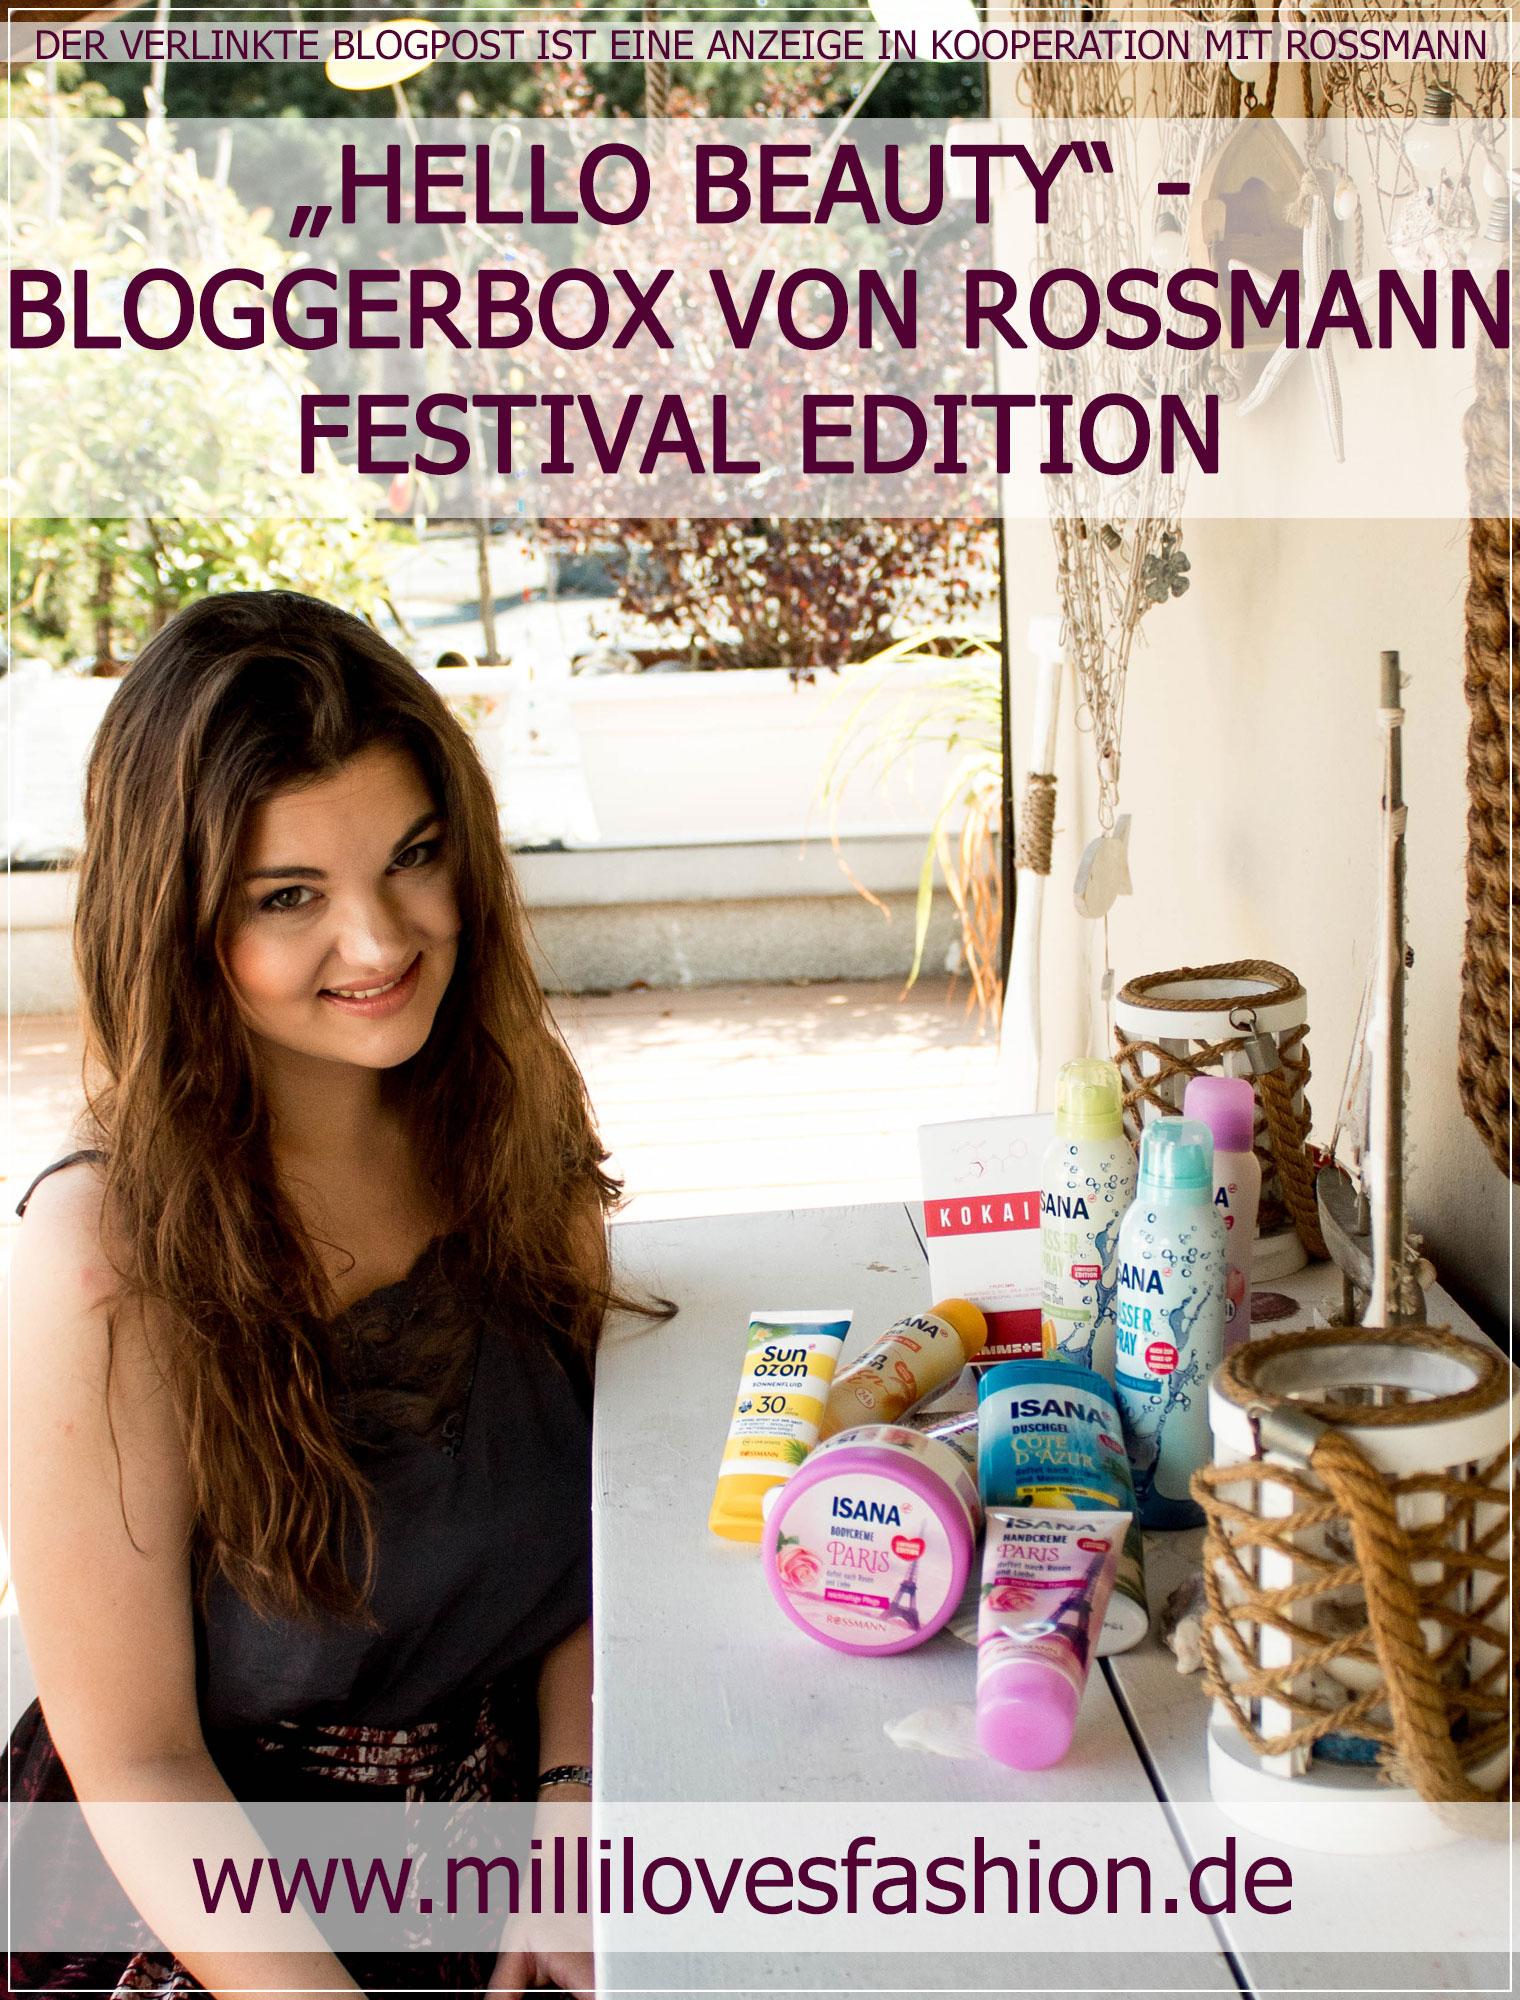 Blogger Box, Rossmann, Beauty Neuheiten, Beautyprodukte, Isana, Sommerprodukte, Festival, Beautyblogger, Ruhrgebiet, Beautybloggerin, Blogger, Drogerie Neuheiten, Drogerie Produkte